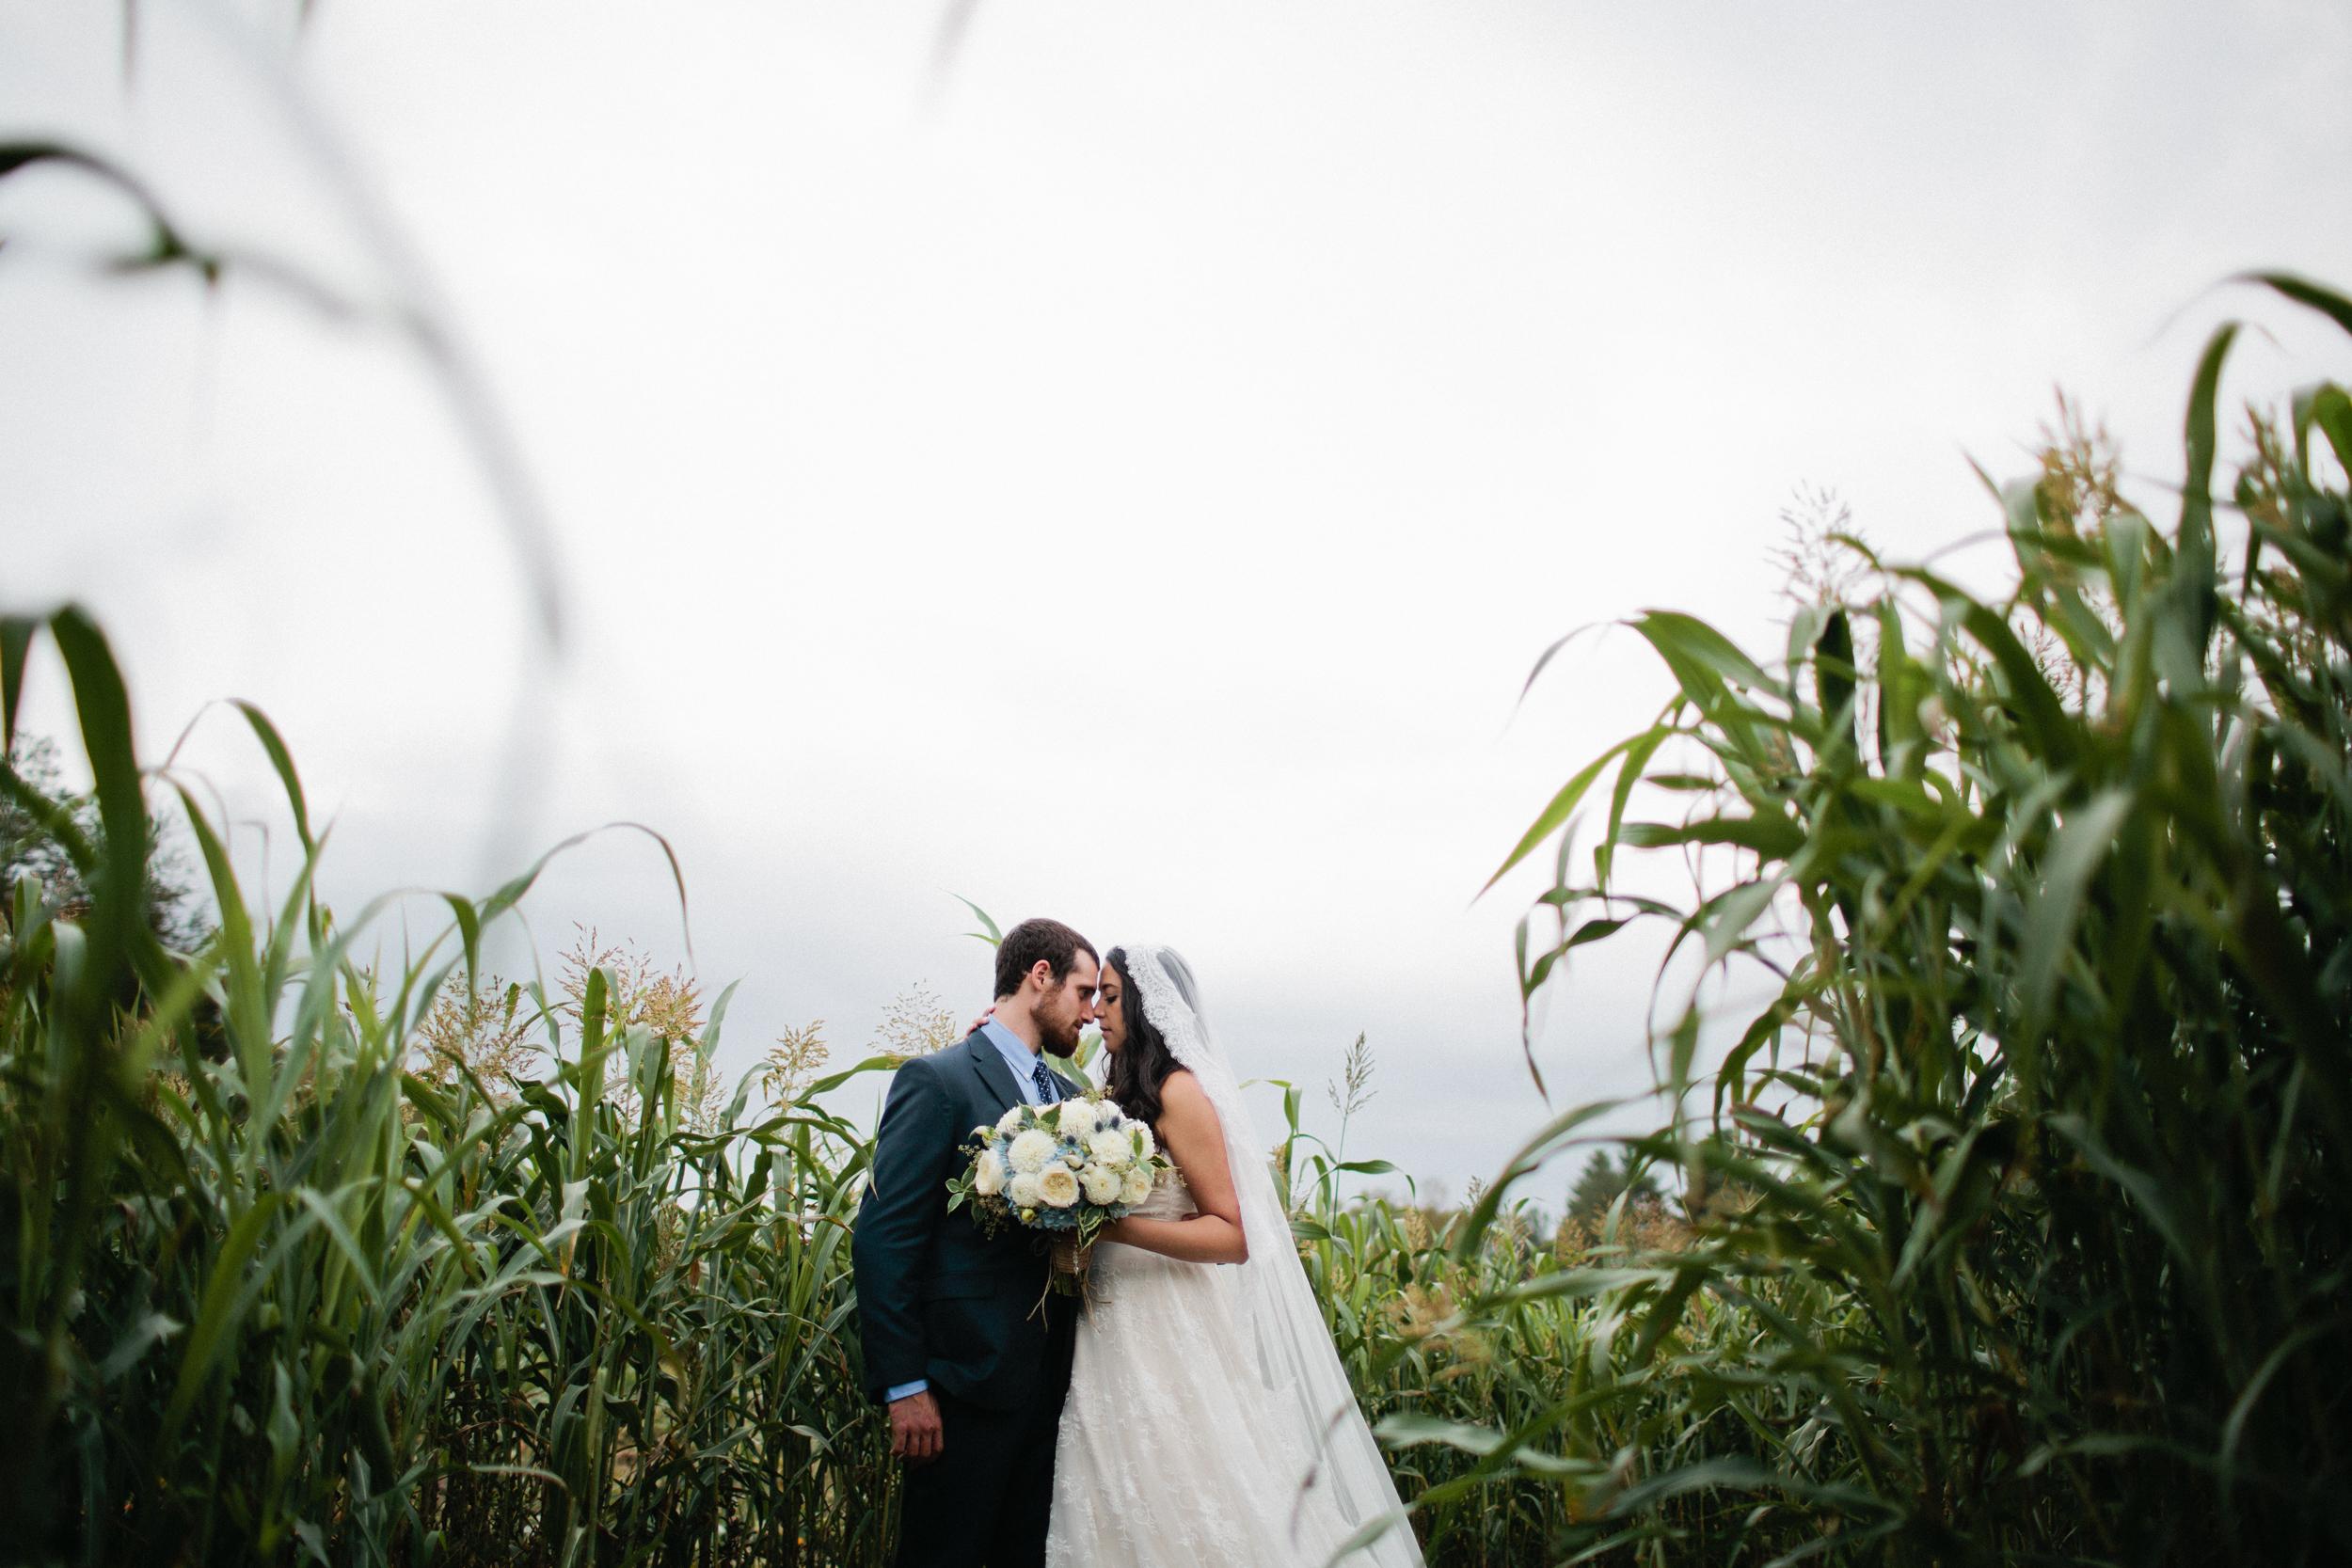 Best-Maine-Wedding-Photographer-1102.jpg